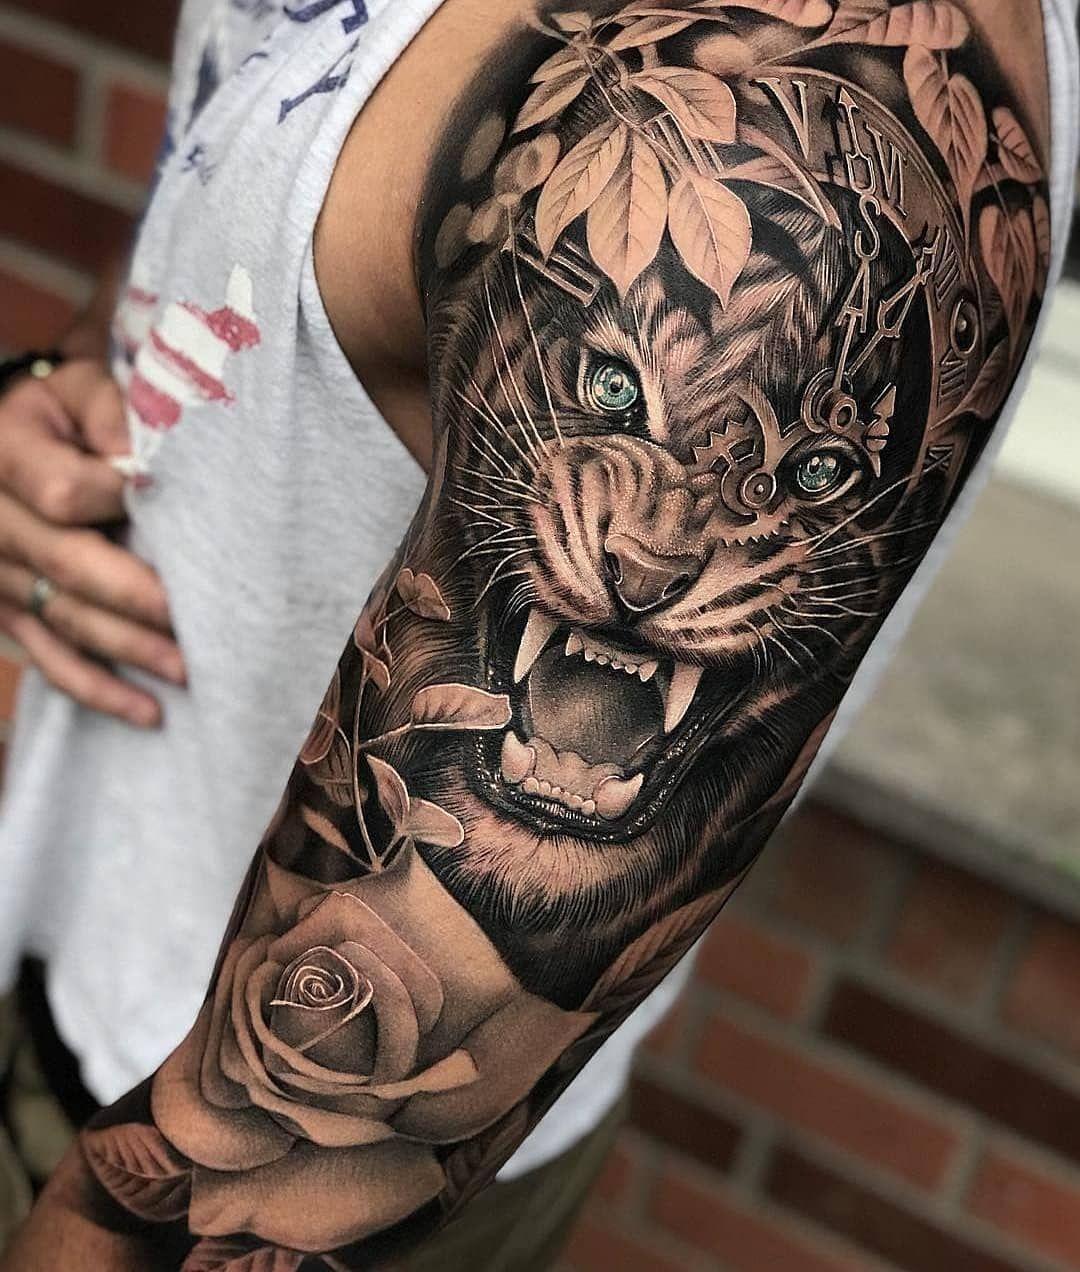 120 Tatuagens masculinas no braço (2018)   Stuff   Tattoos ...